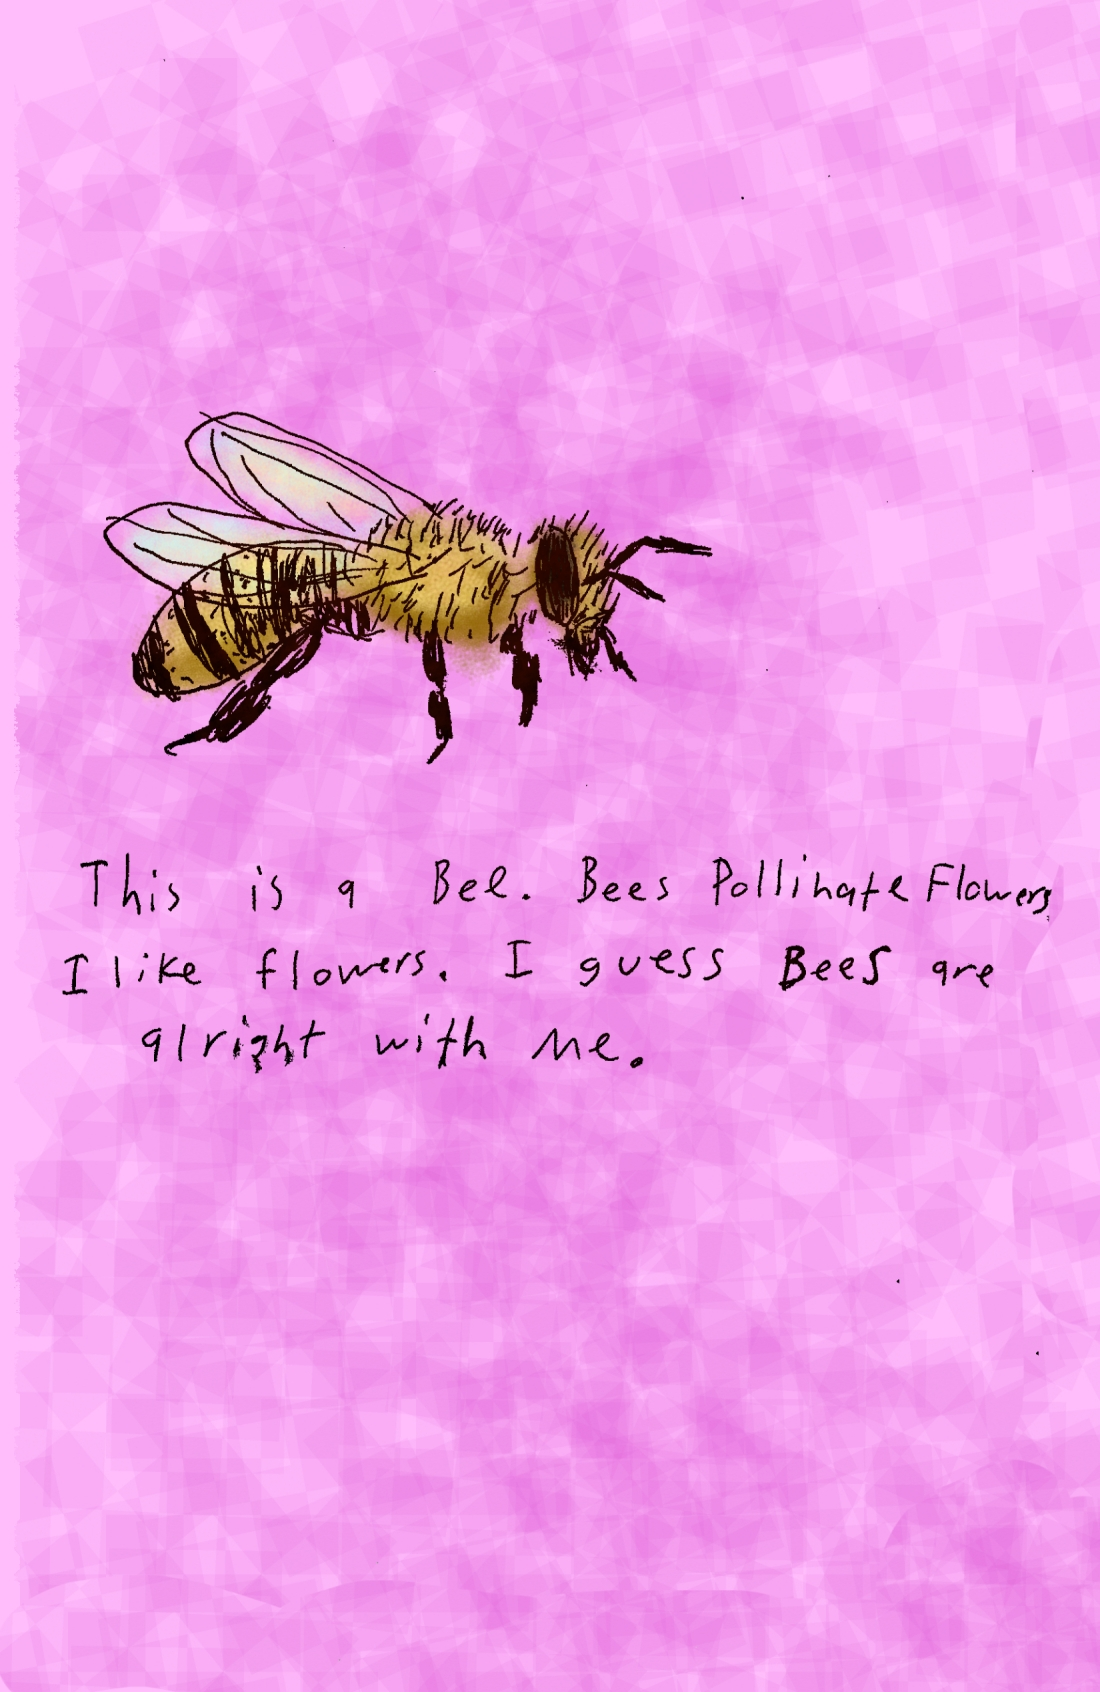 bugs pg 6 c